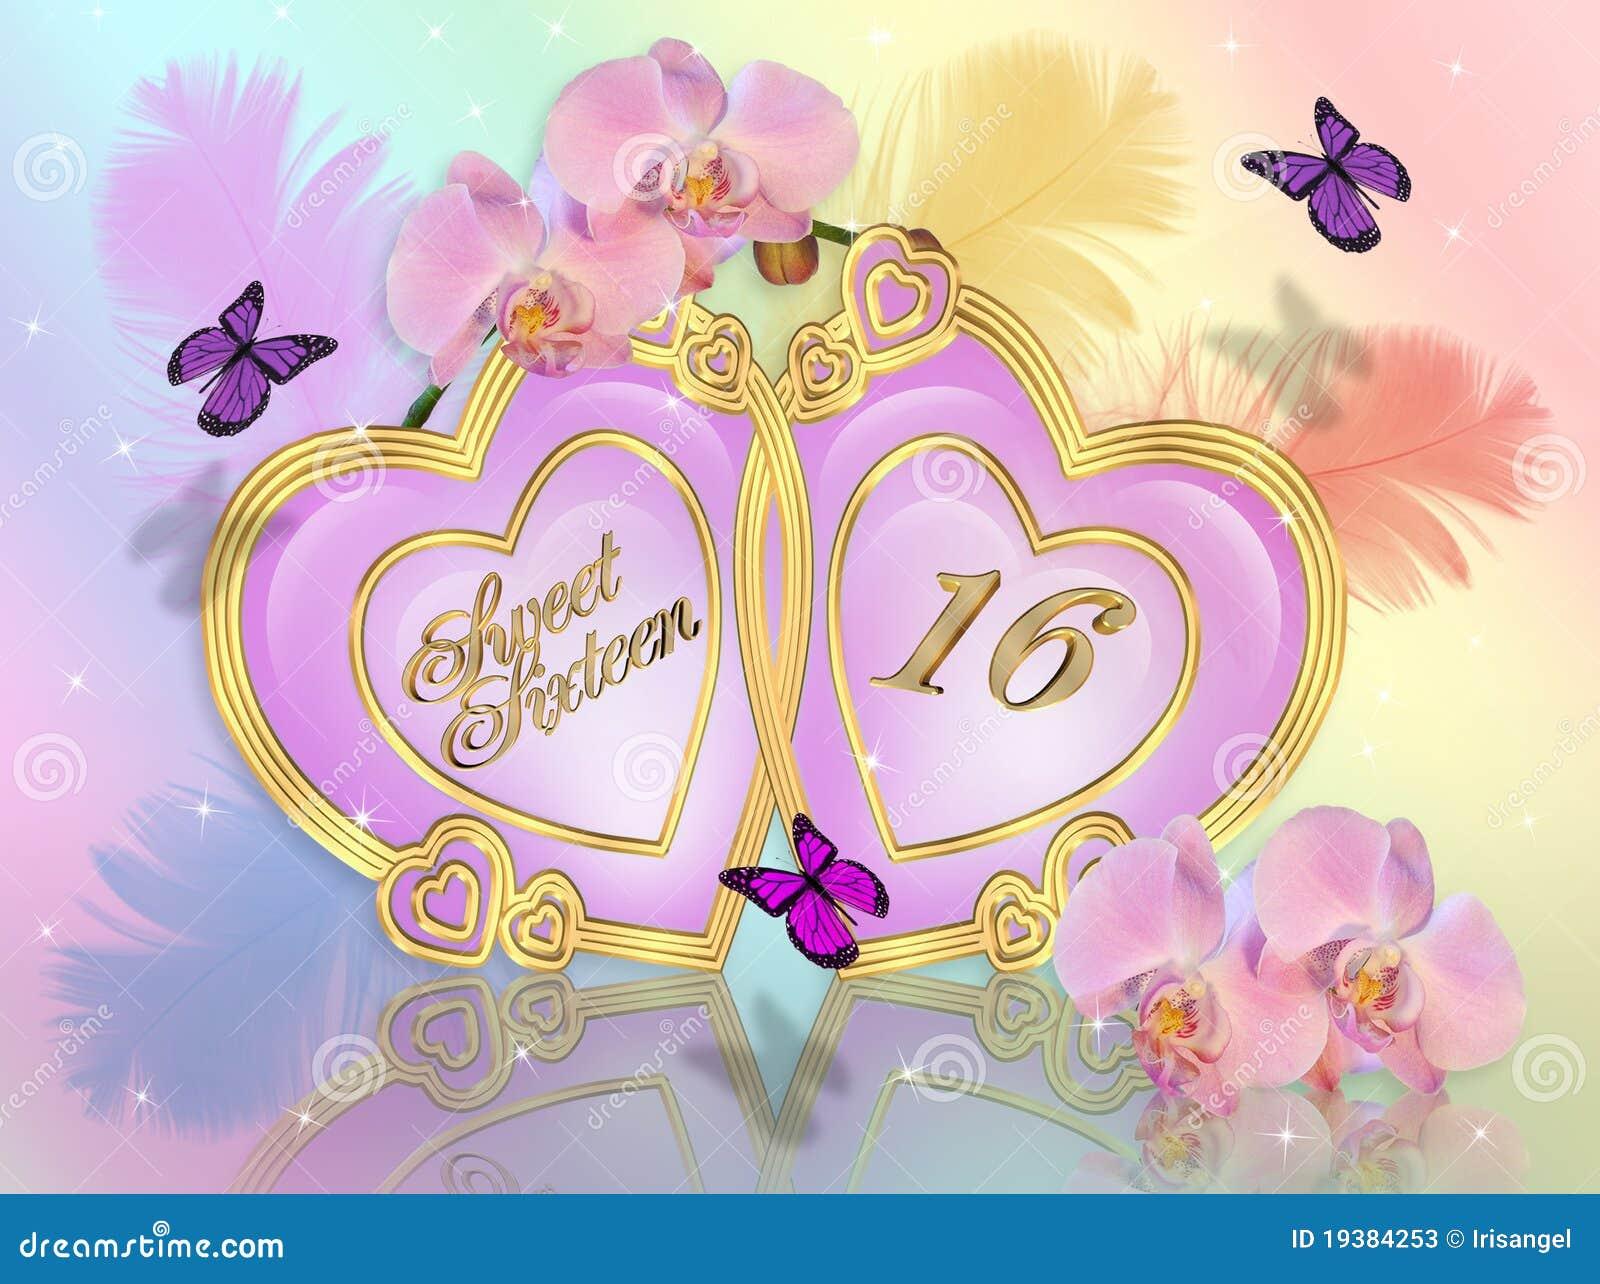 Sweet 16 Invitation Graphic Stock Illustration Illustration Of